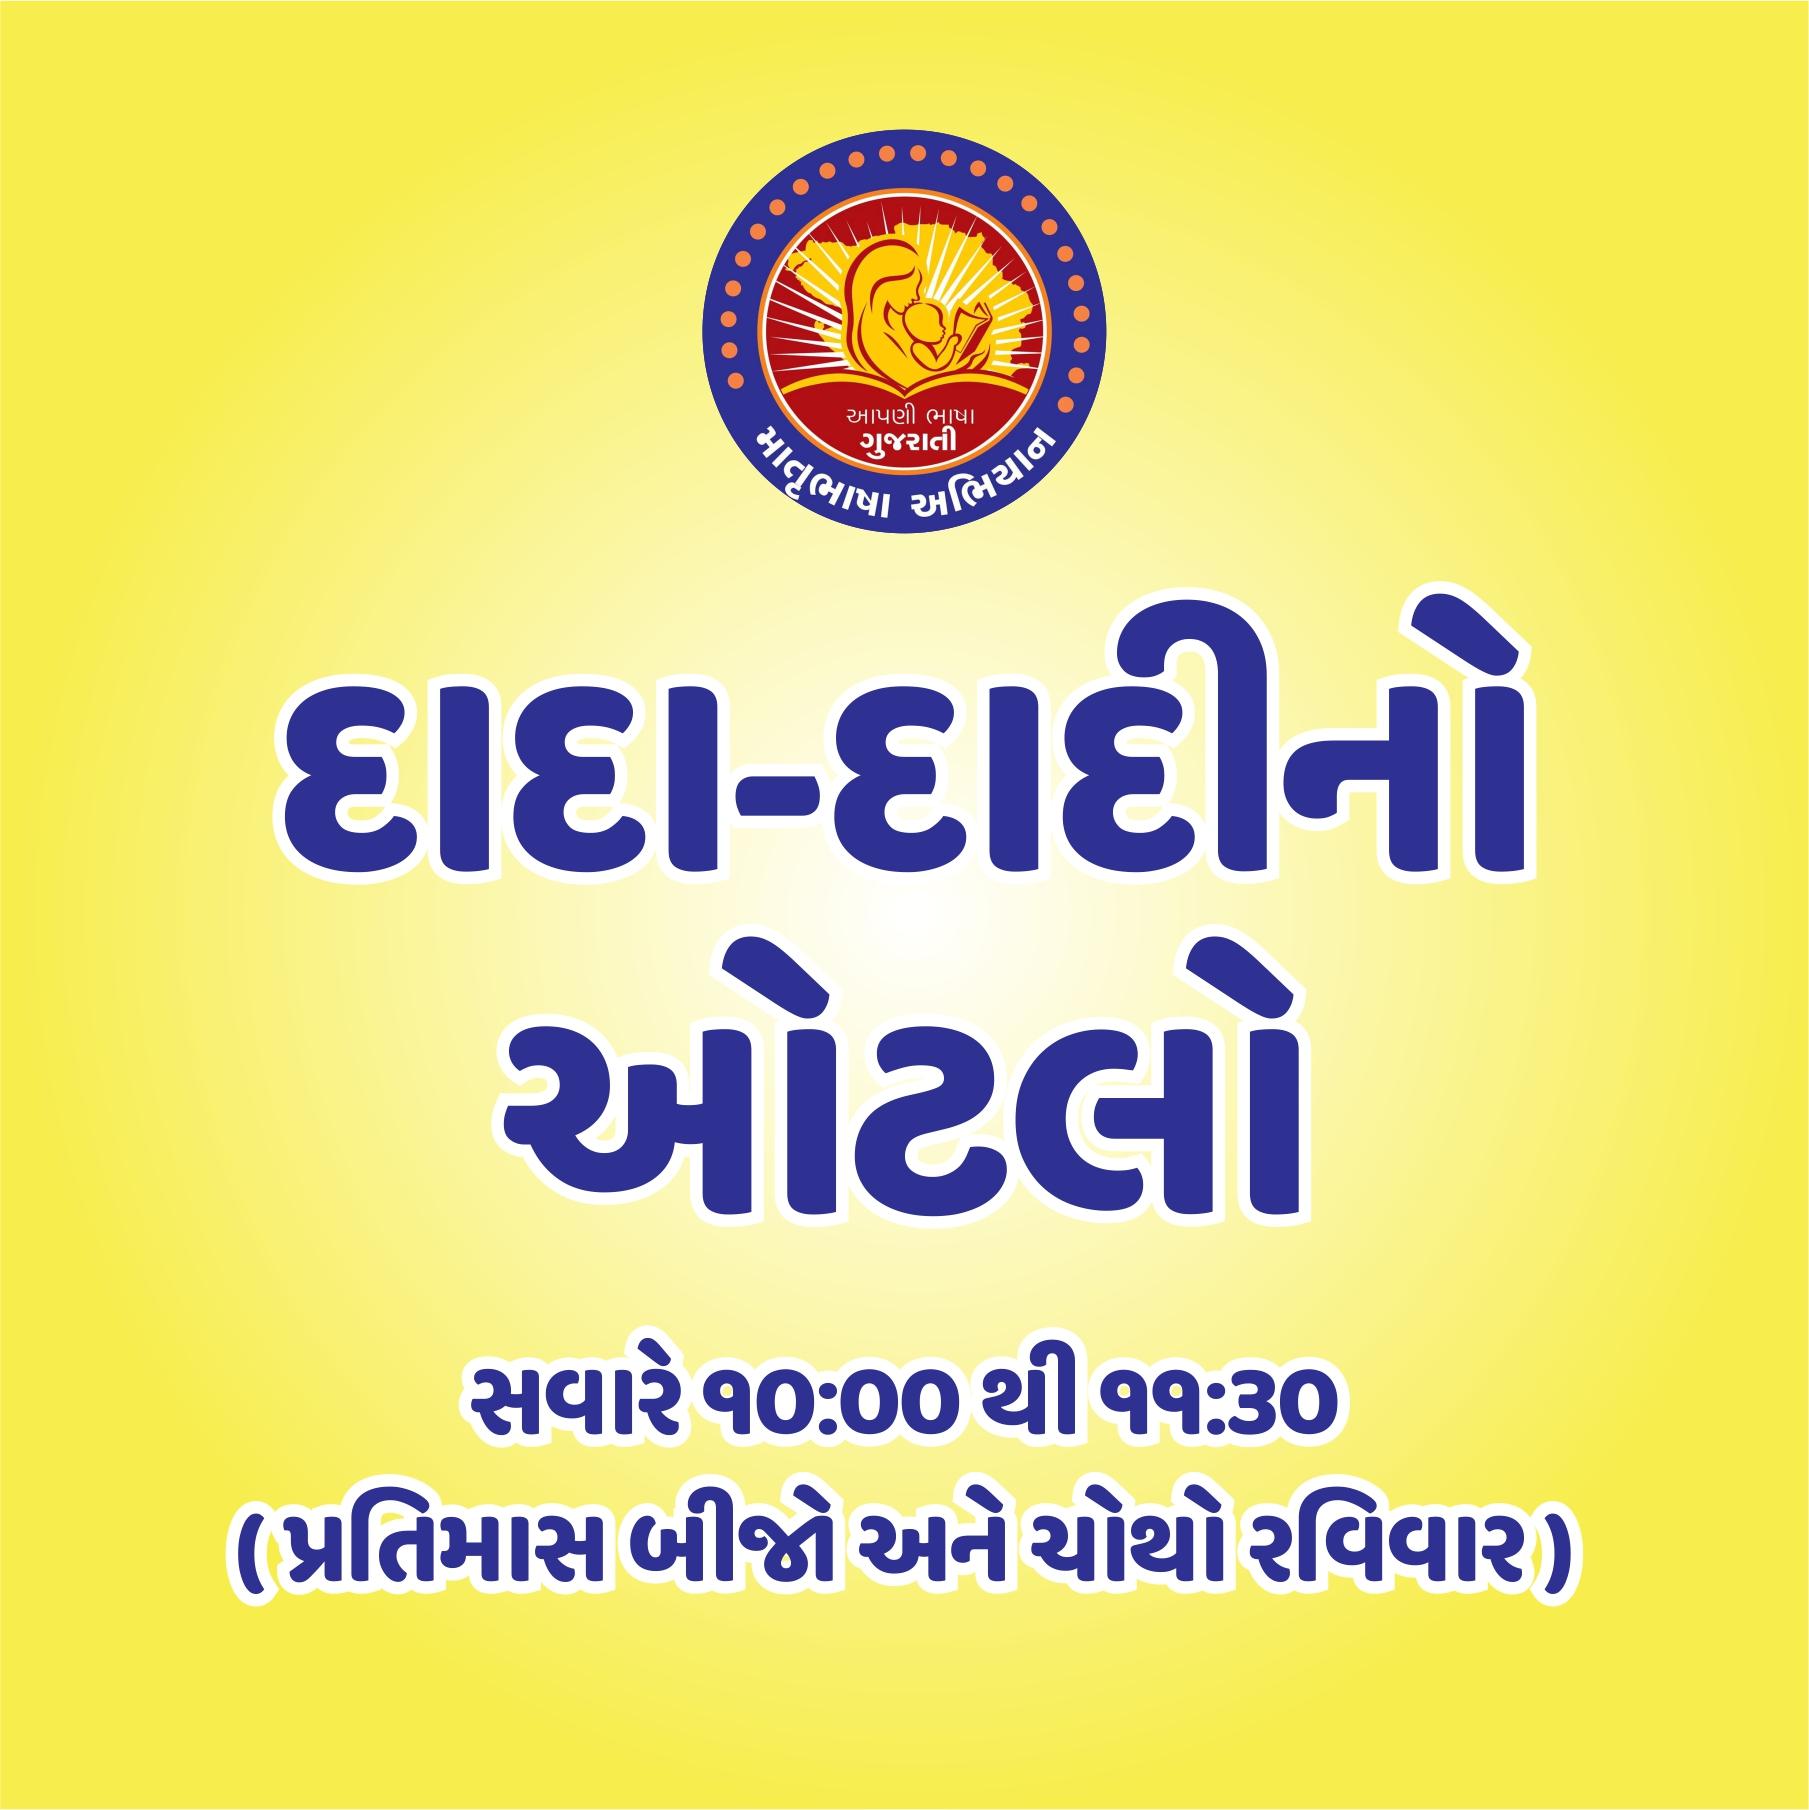 3dd223be493ed Dada Dadi No Otlo - Ahmedabad